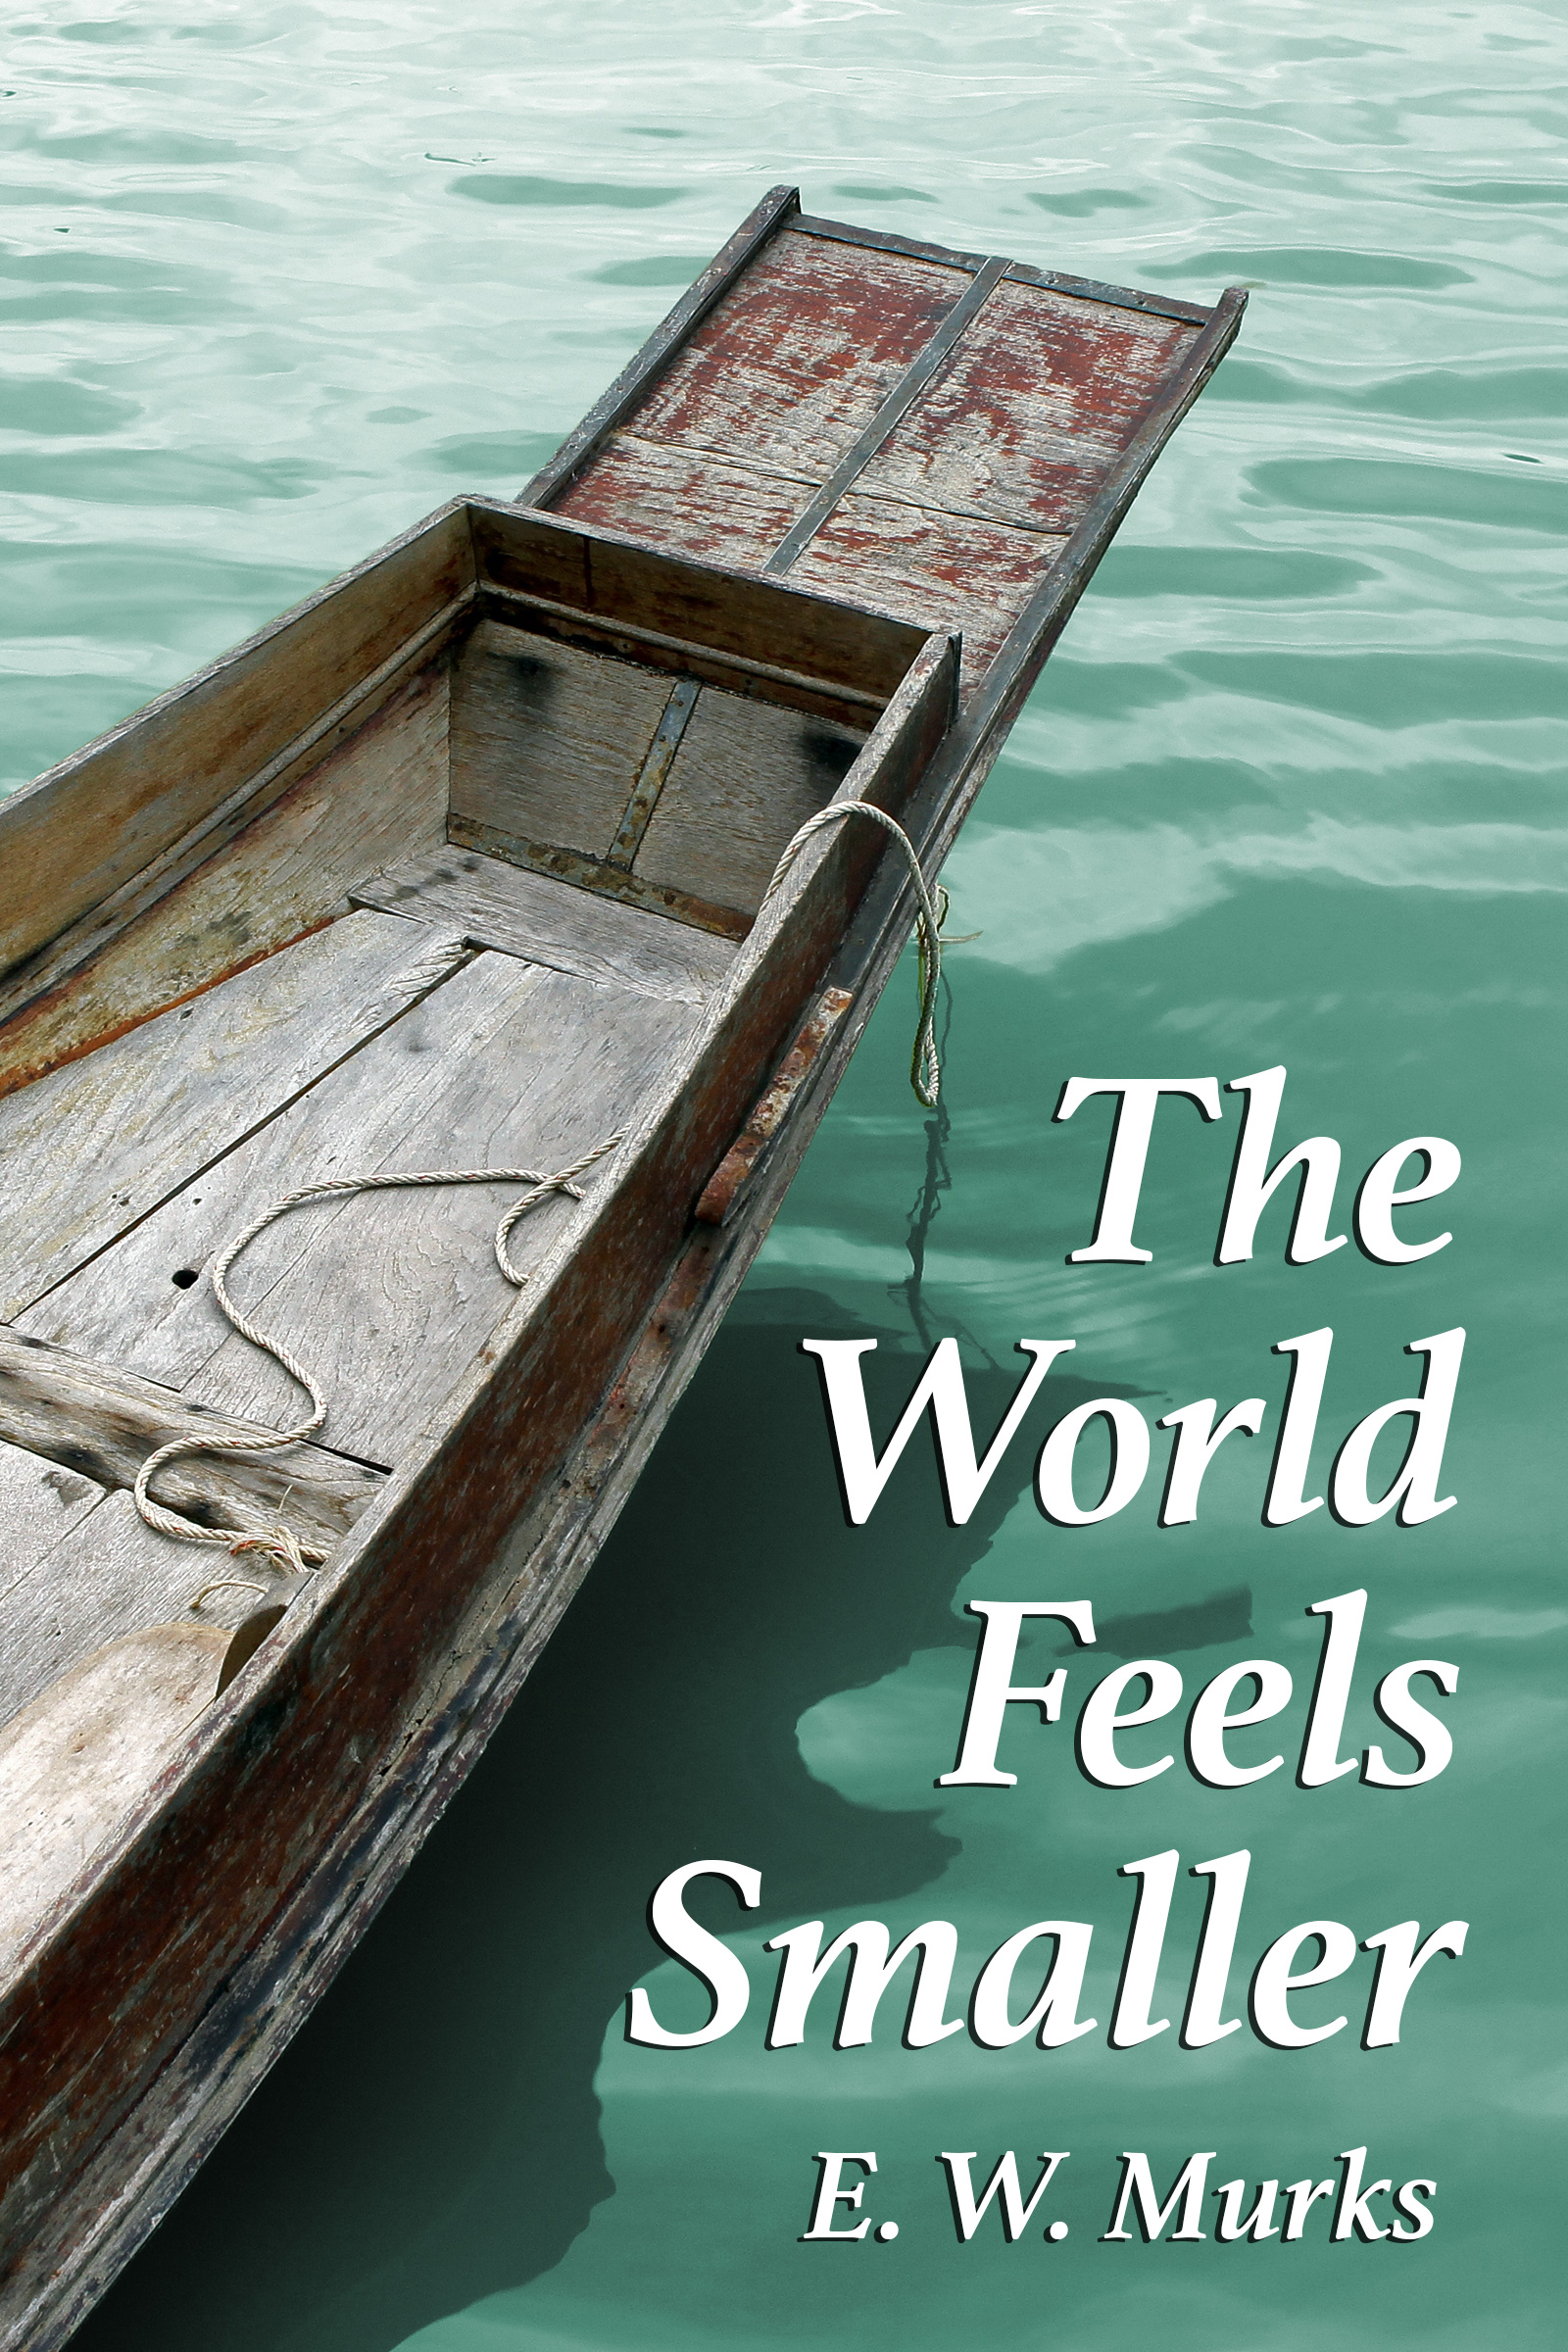 The World Feels Smaller